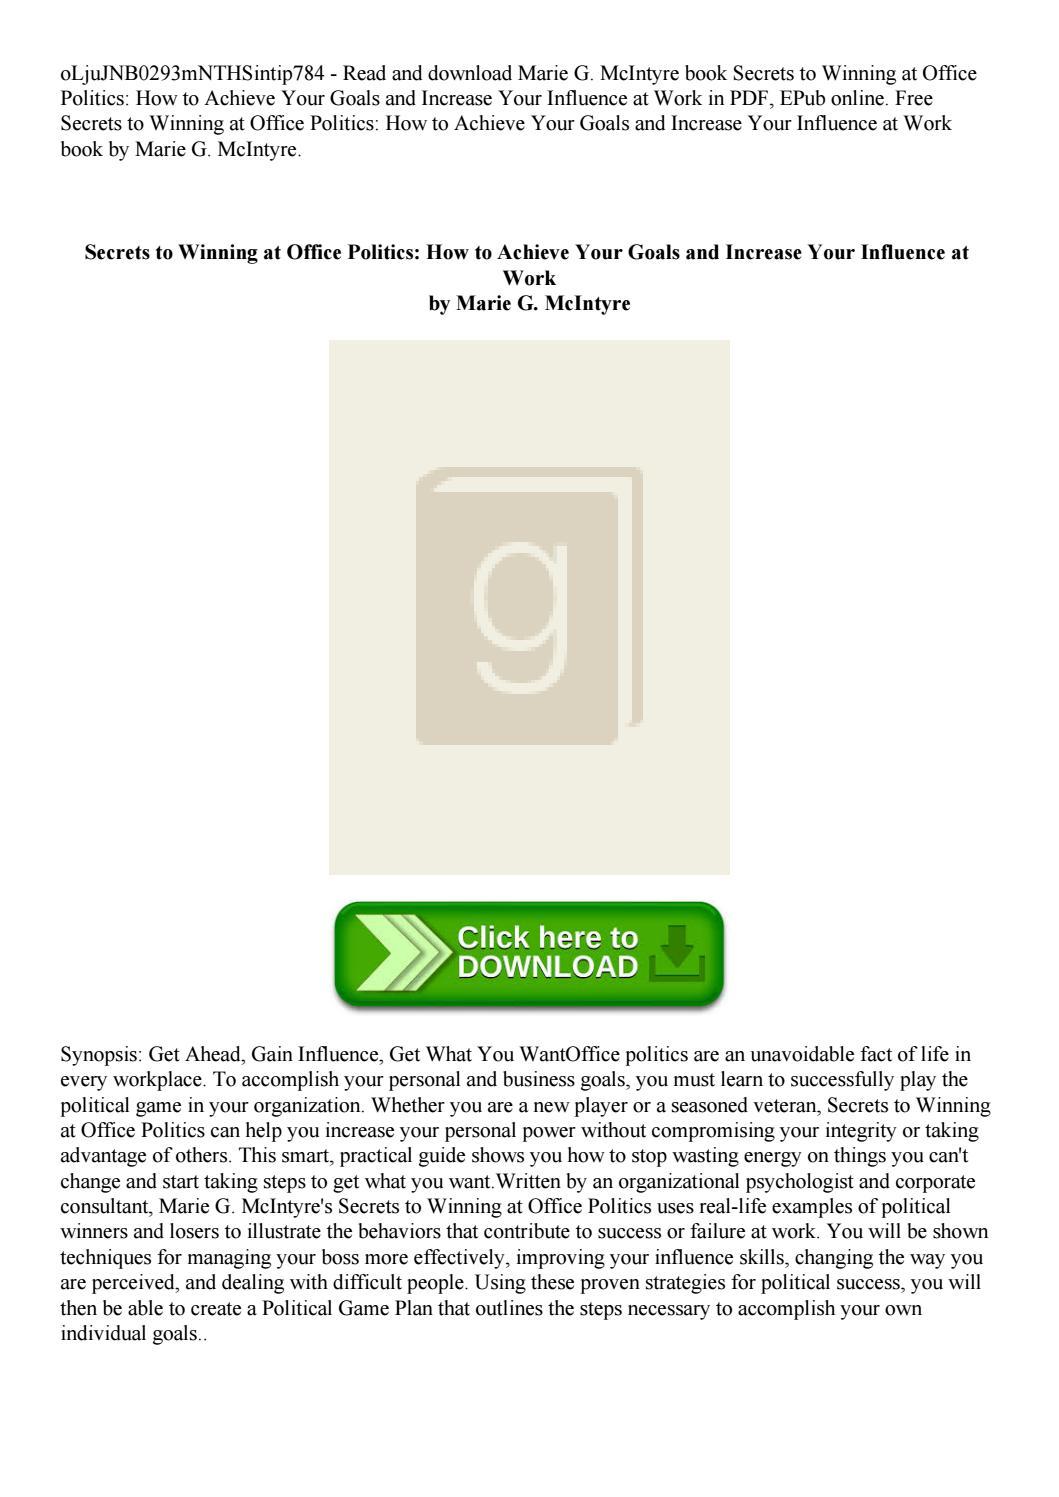 secrets to winning at office politics free pdf download